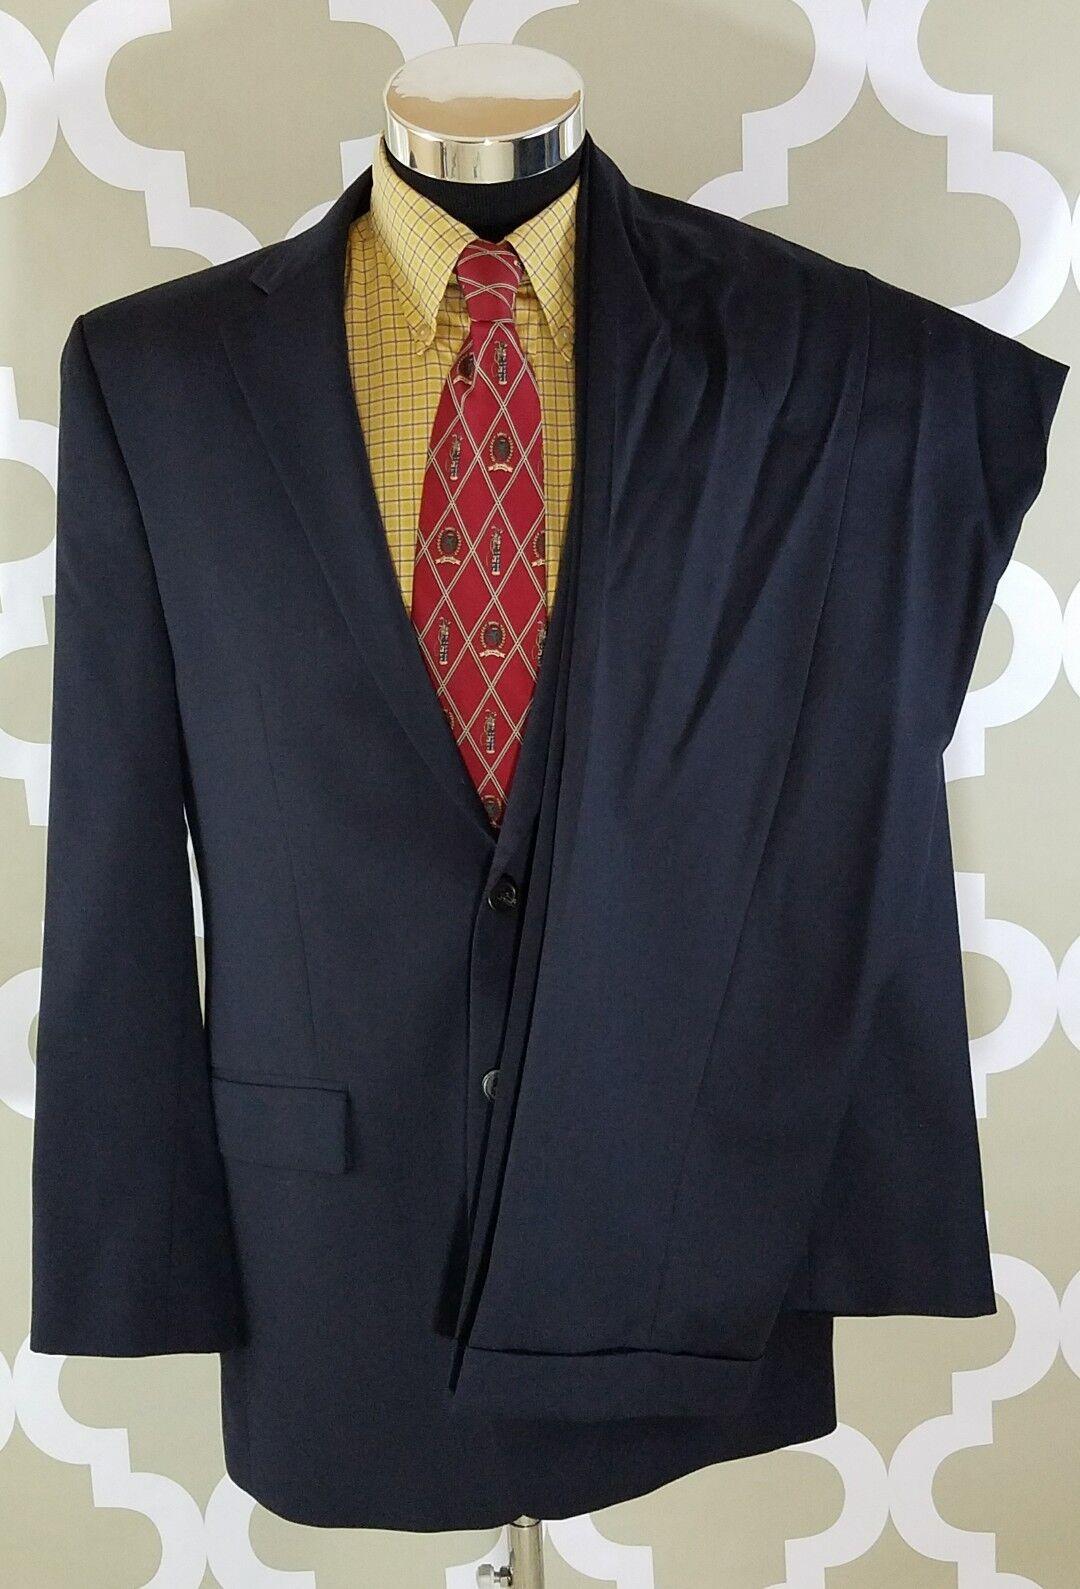 Lauren Ralph Wool Lauren Navy Suit 100% Wool Ralph 2 Button Blazer Größe 40 L, 34×32 Pants 862511